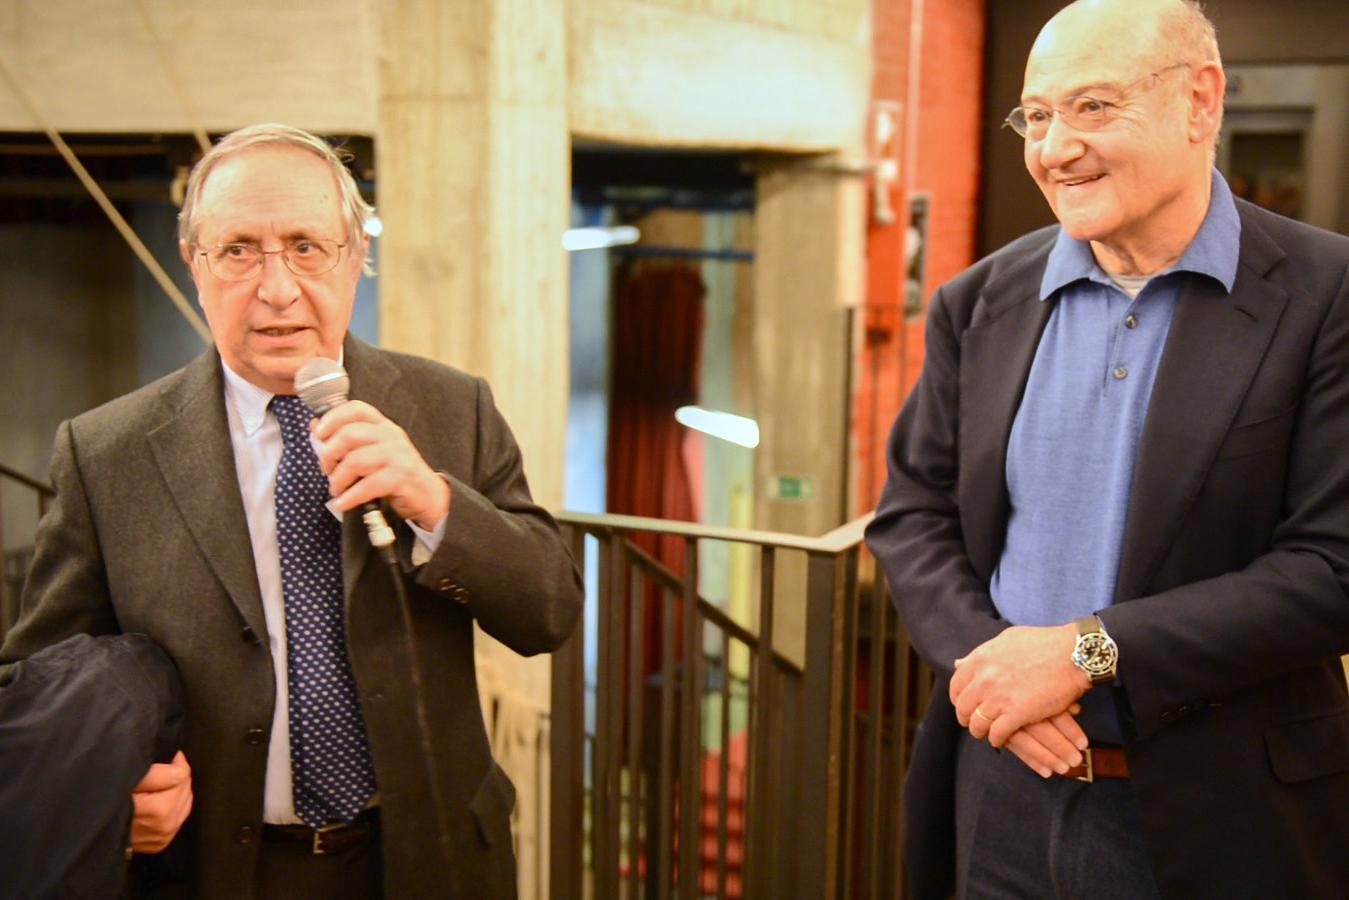 Raffaele Besso, president of Jewish community of Milan